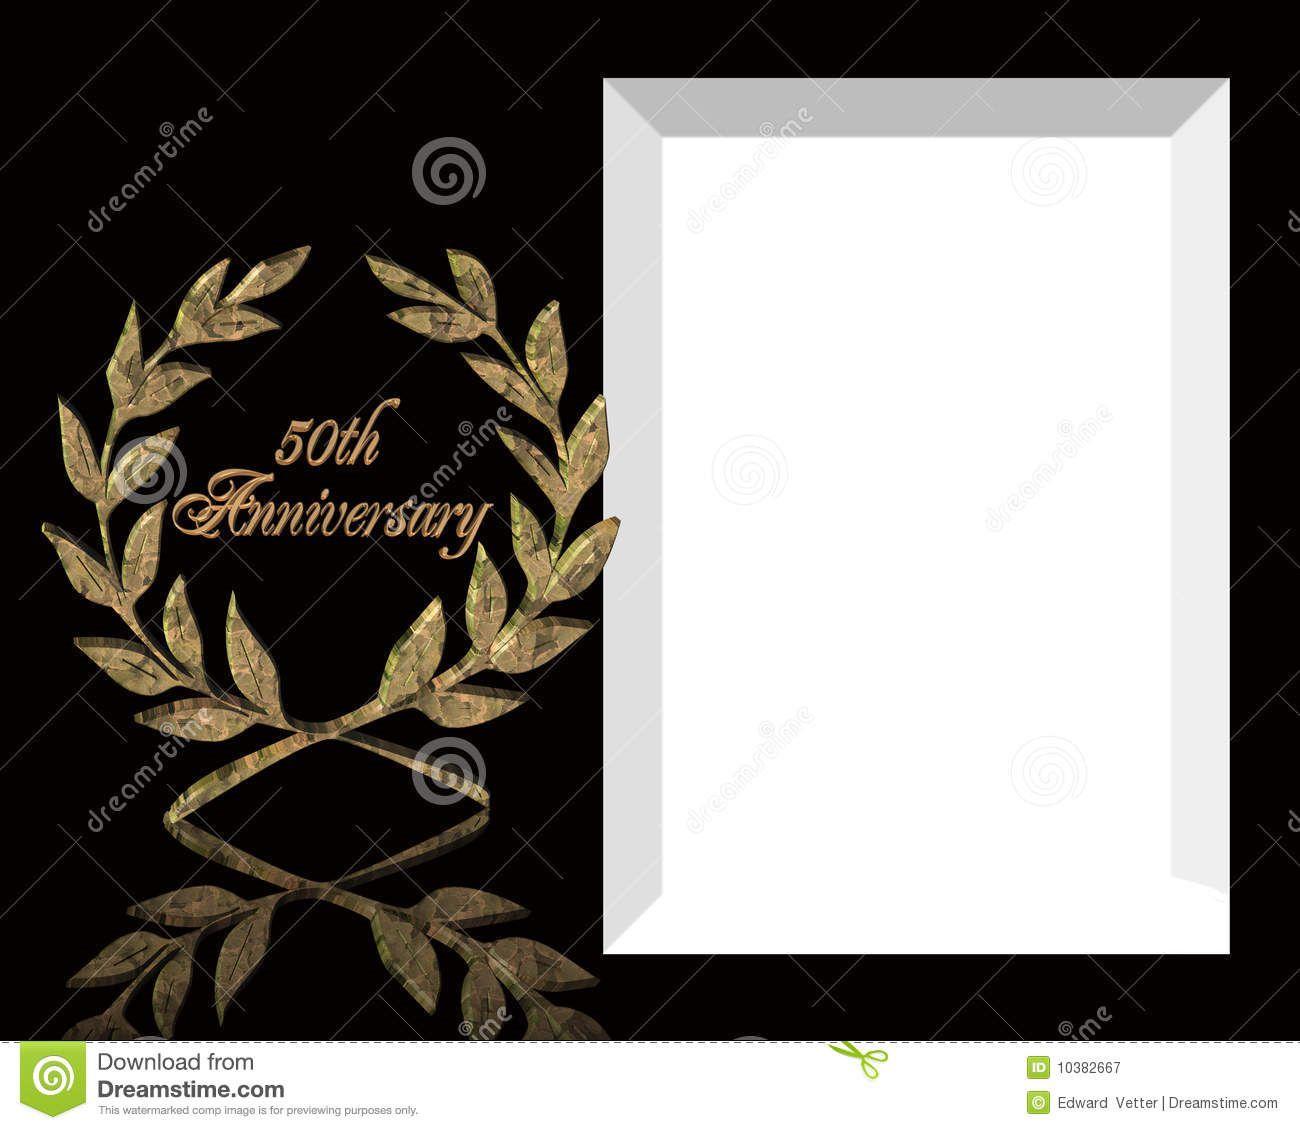 005 Wondrou 50th Anniversary Invitation Template Free Download Image  Golden WeddingFull